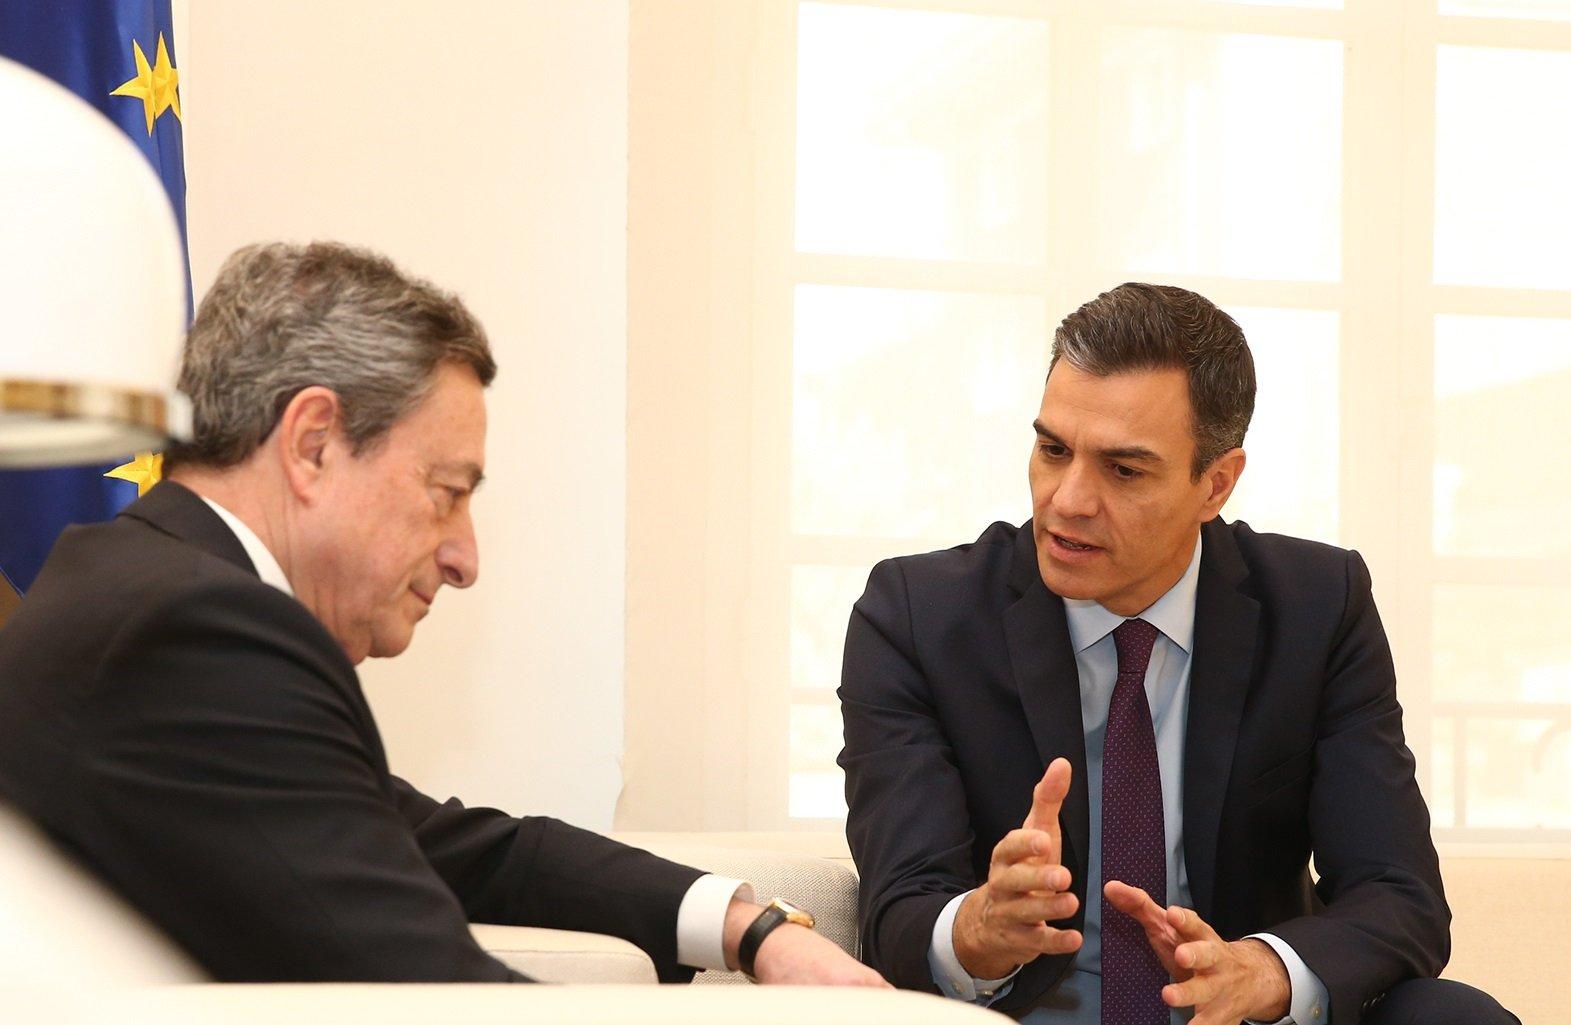 Draghi apremia a Pedro Sánchez a recortar la deuda pública, fuera de órbita.